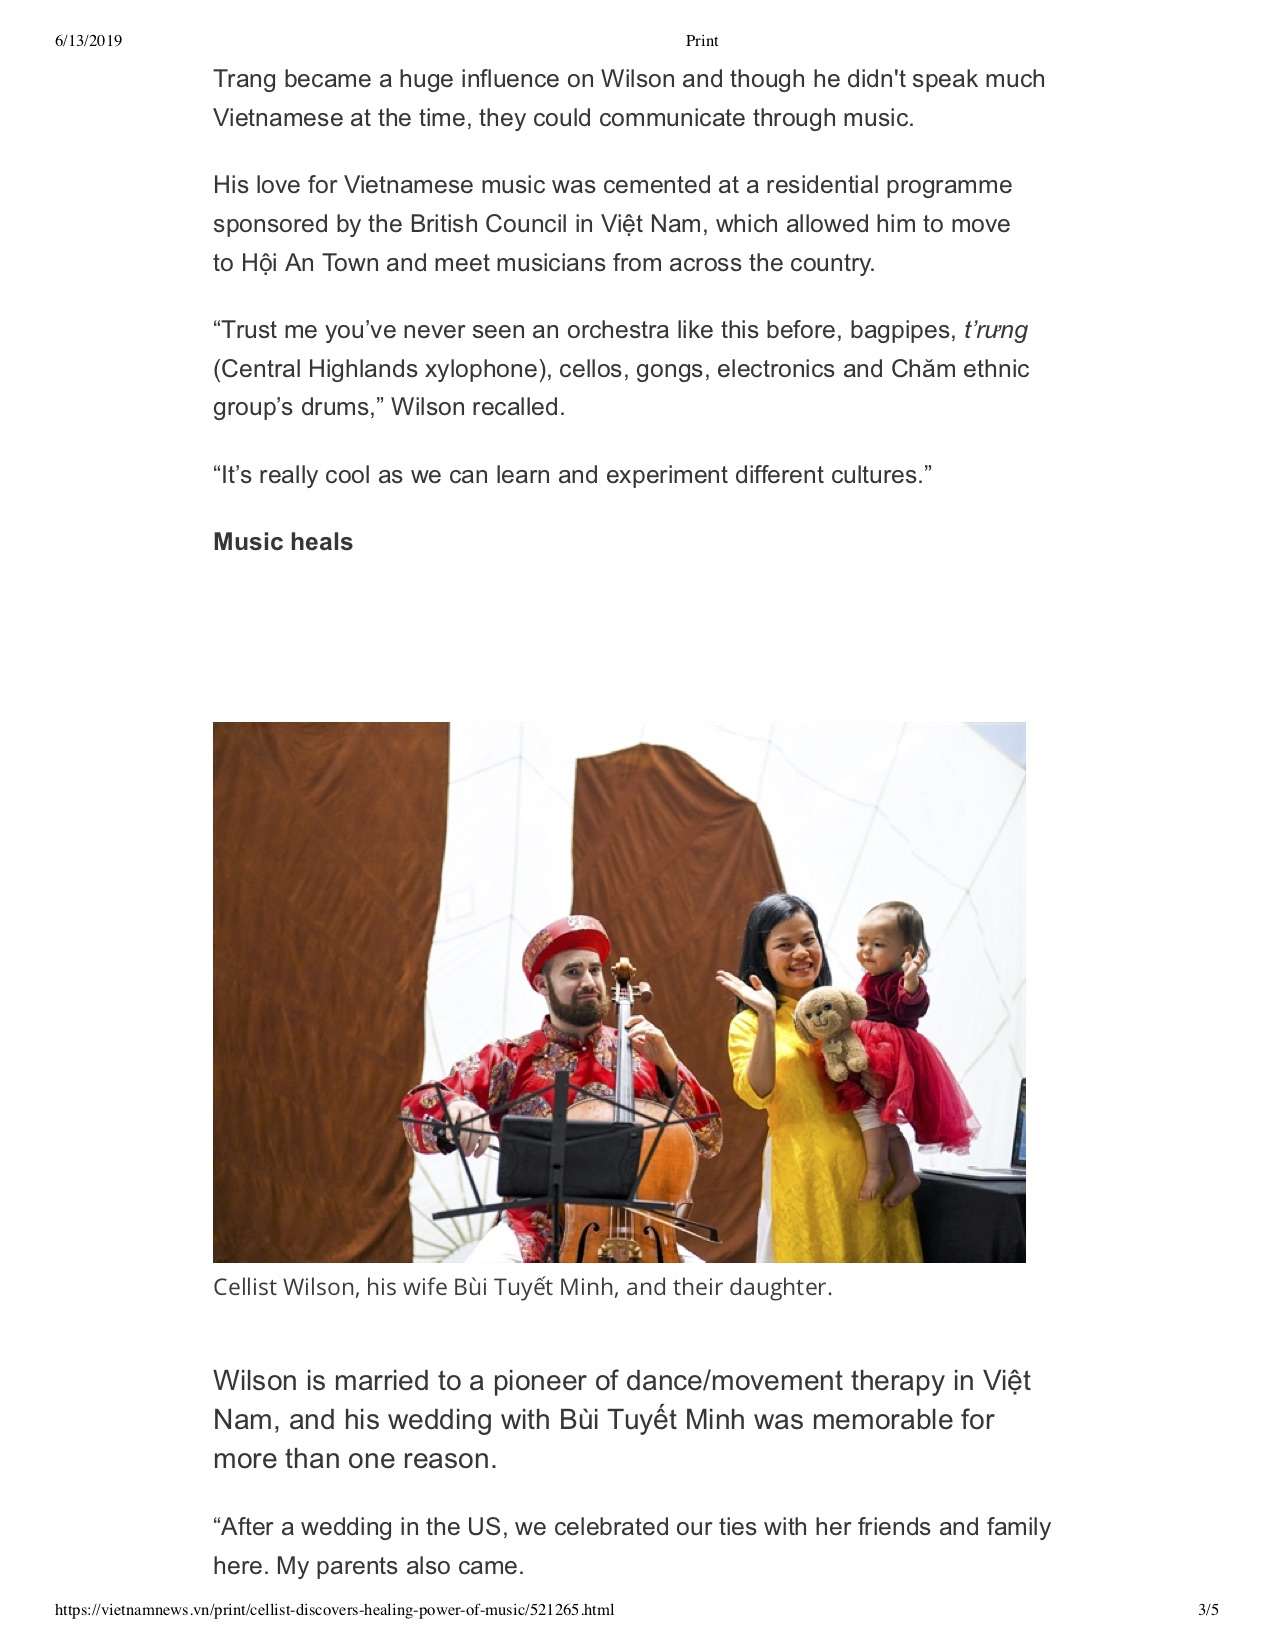 Vietnam_News_Article_page_3.jpg